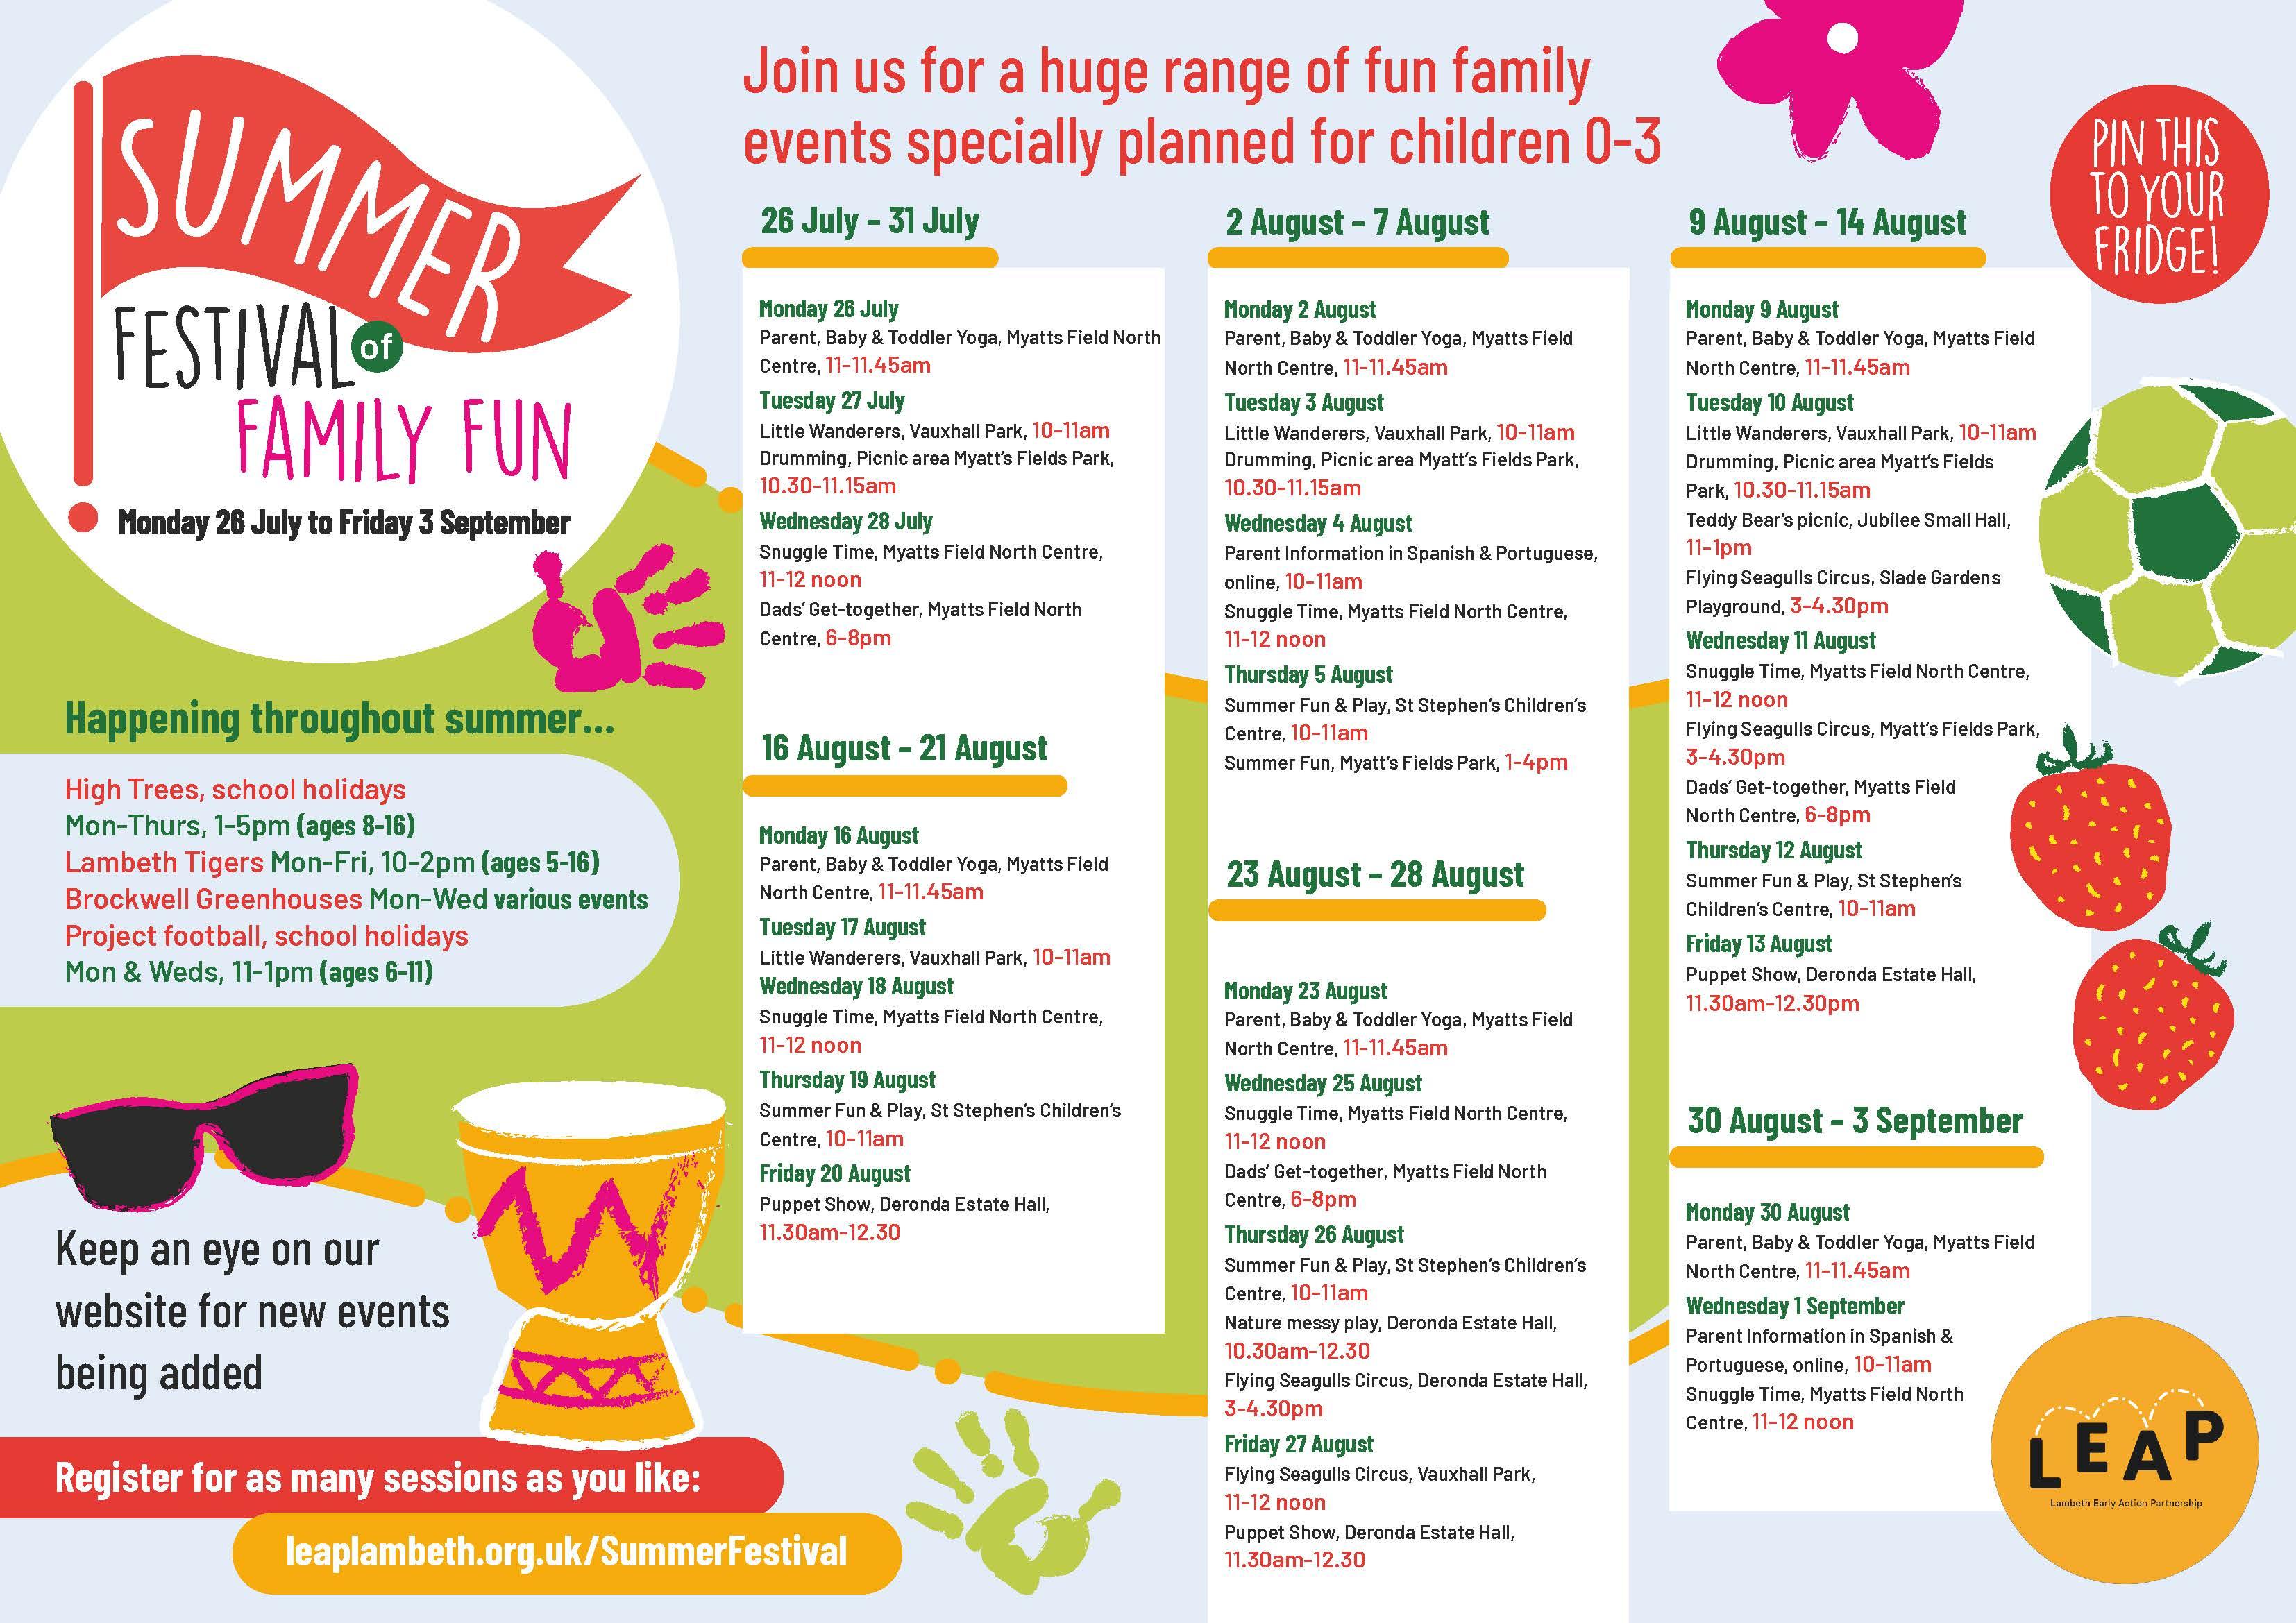 Leapsummer festival calendara3